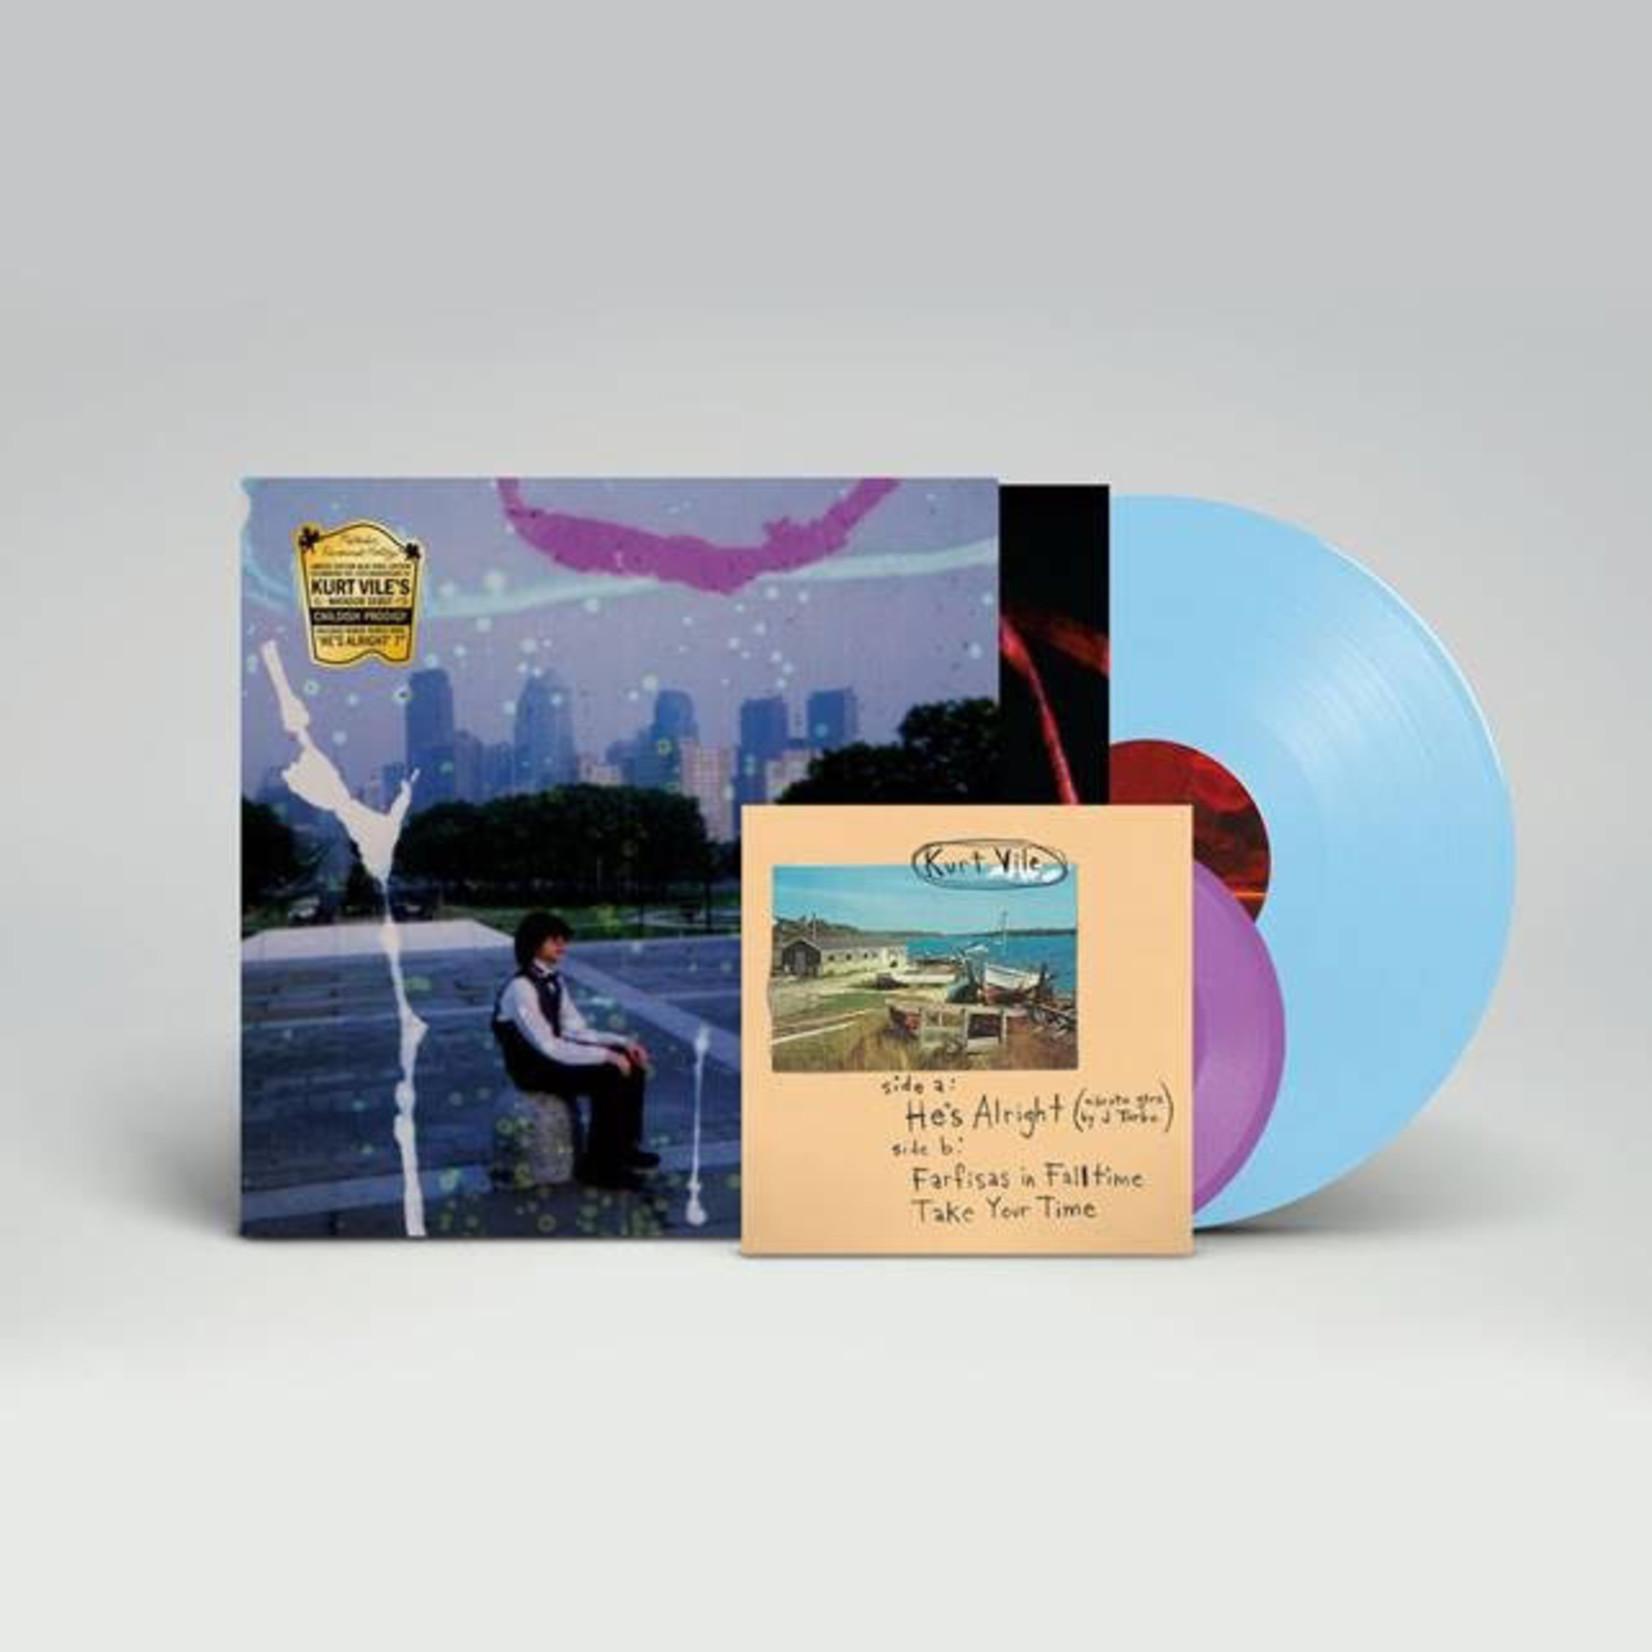 VILE_KURT - Childish Prodigy LTD. EDITION Blue Vinyl   (VINYL)